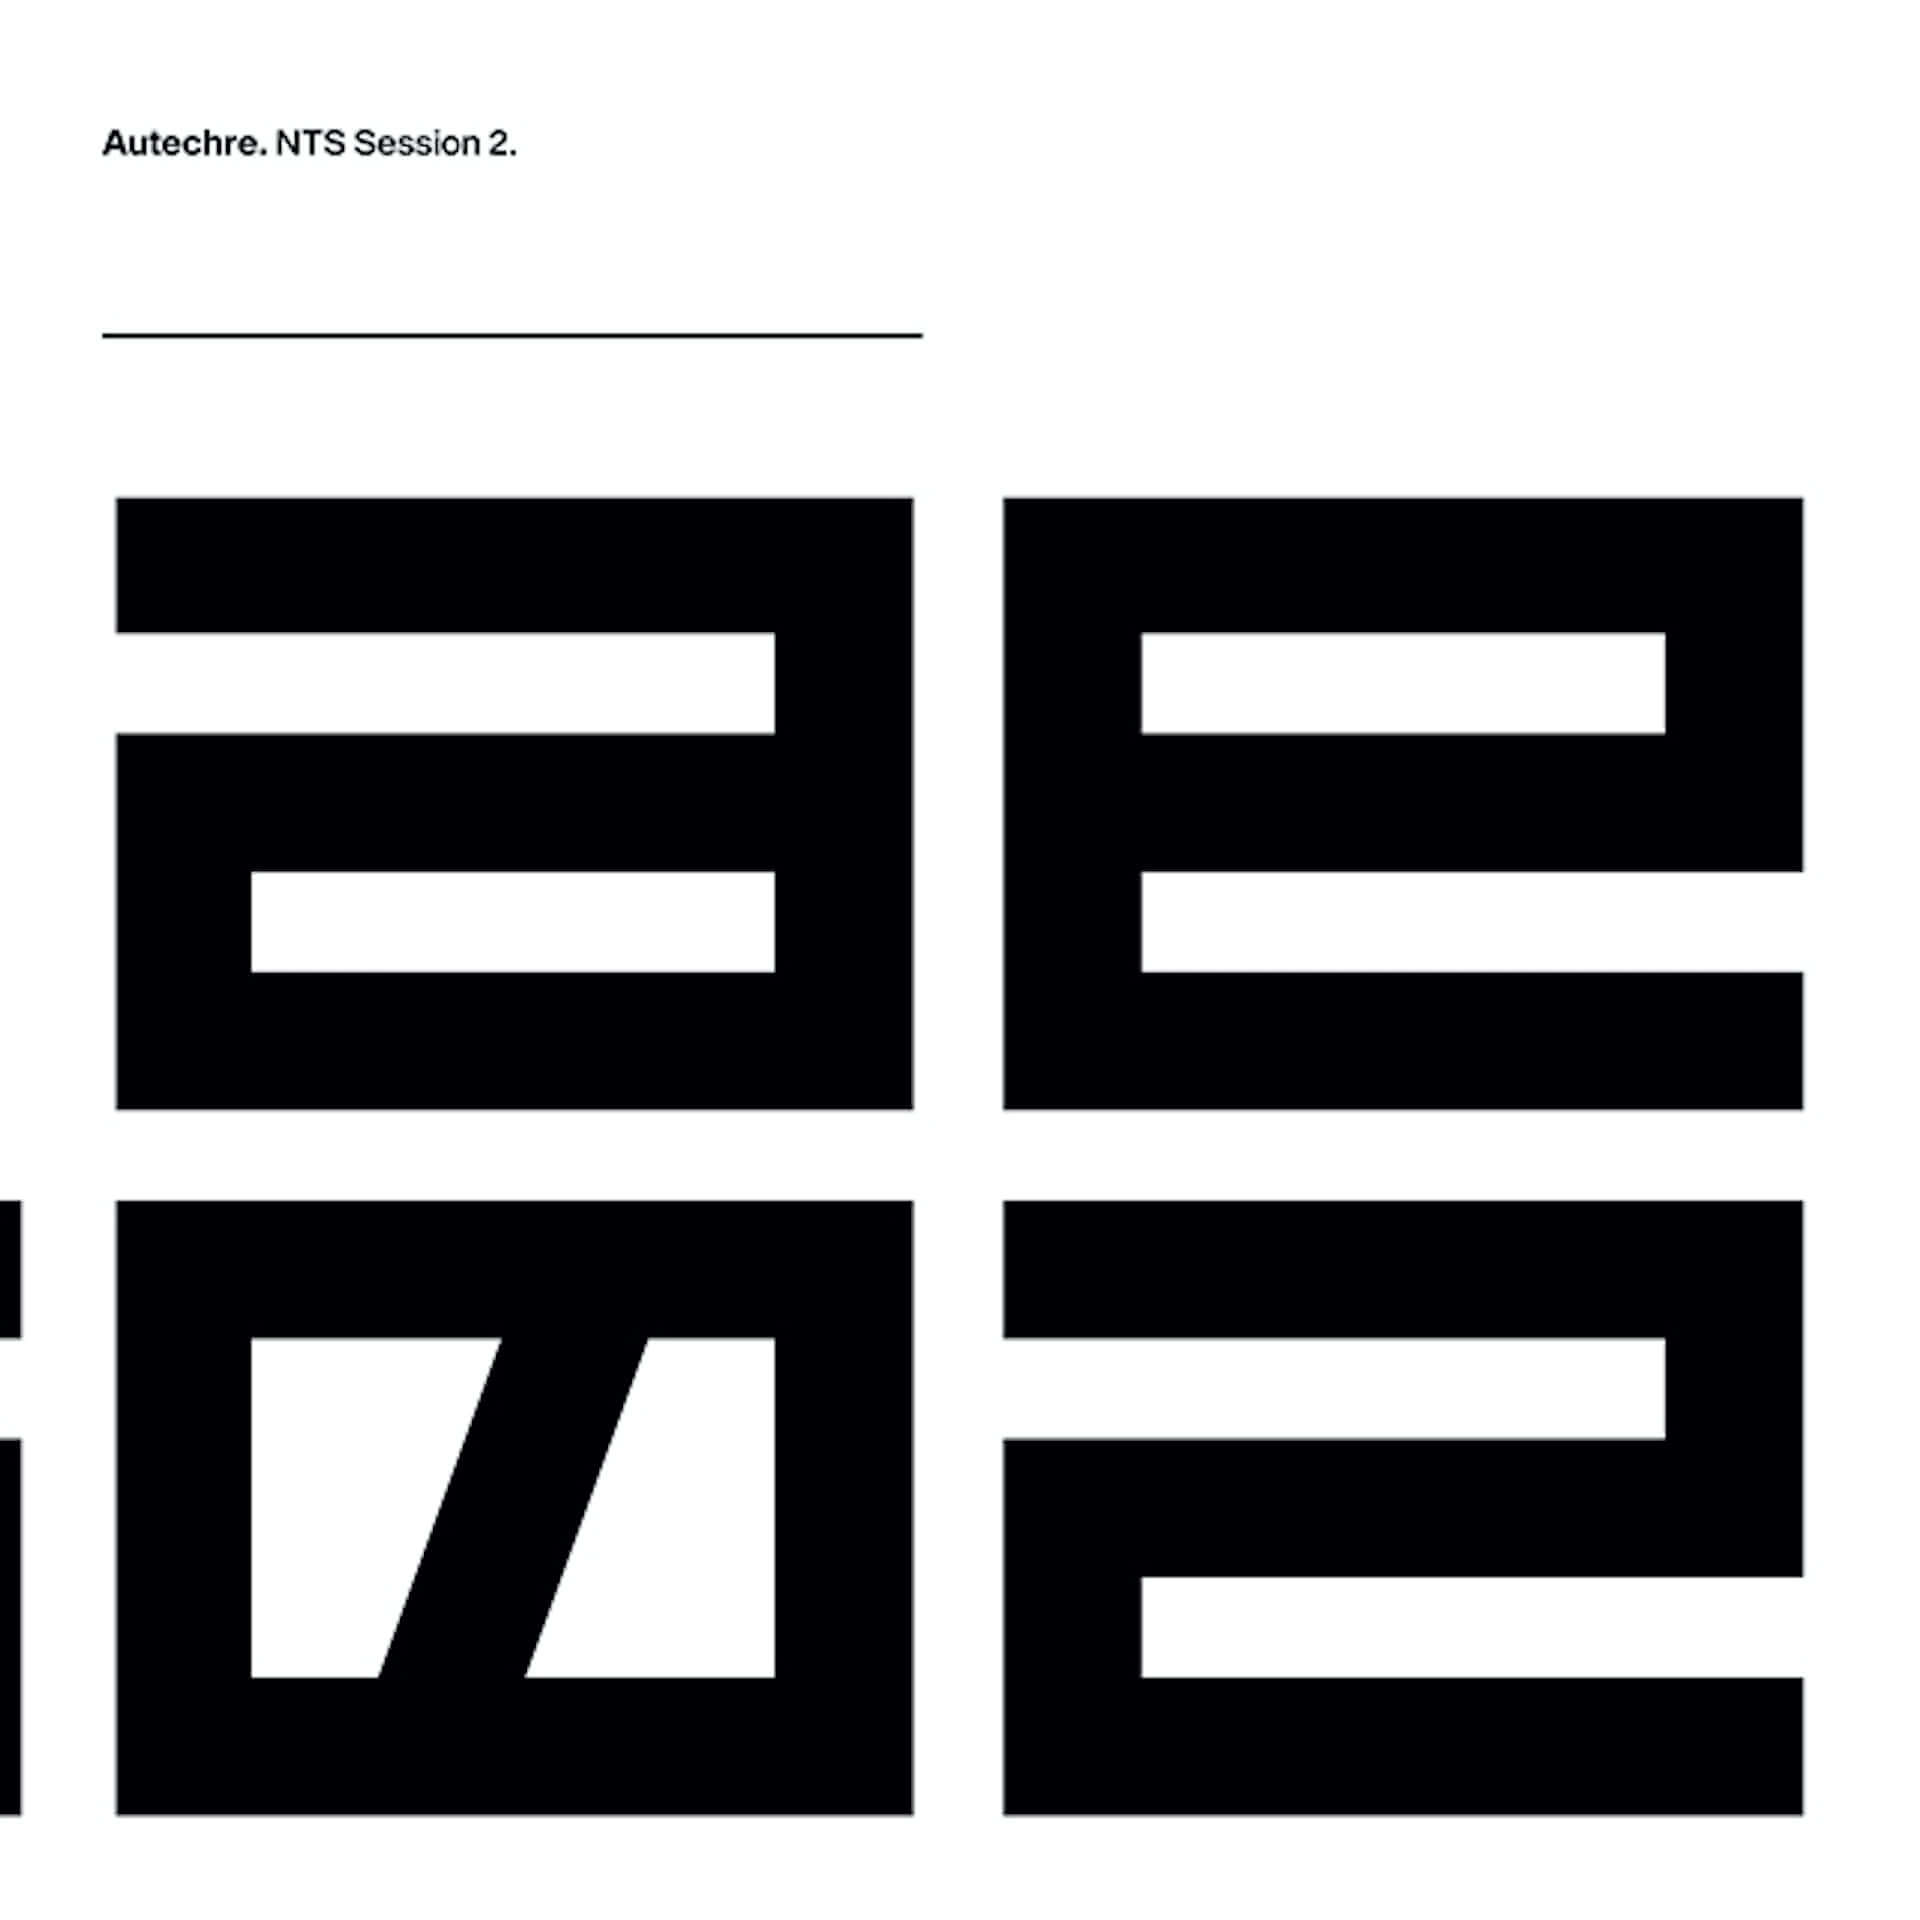 Autechreが2016年〜2018年のライブ音源7作をリリース!至極のIDM/エレクトロニカ作品 music200410_autechre_3-1920x1920